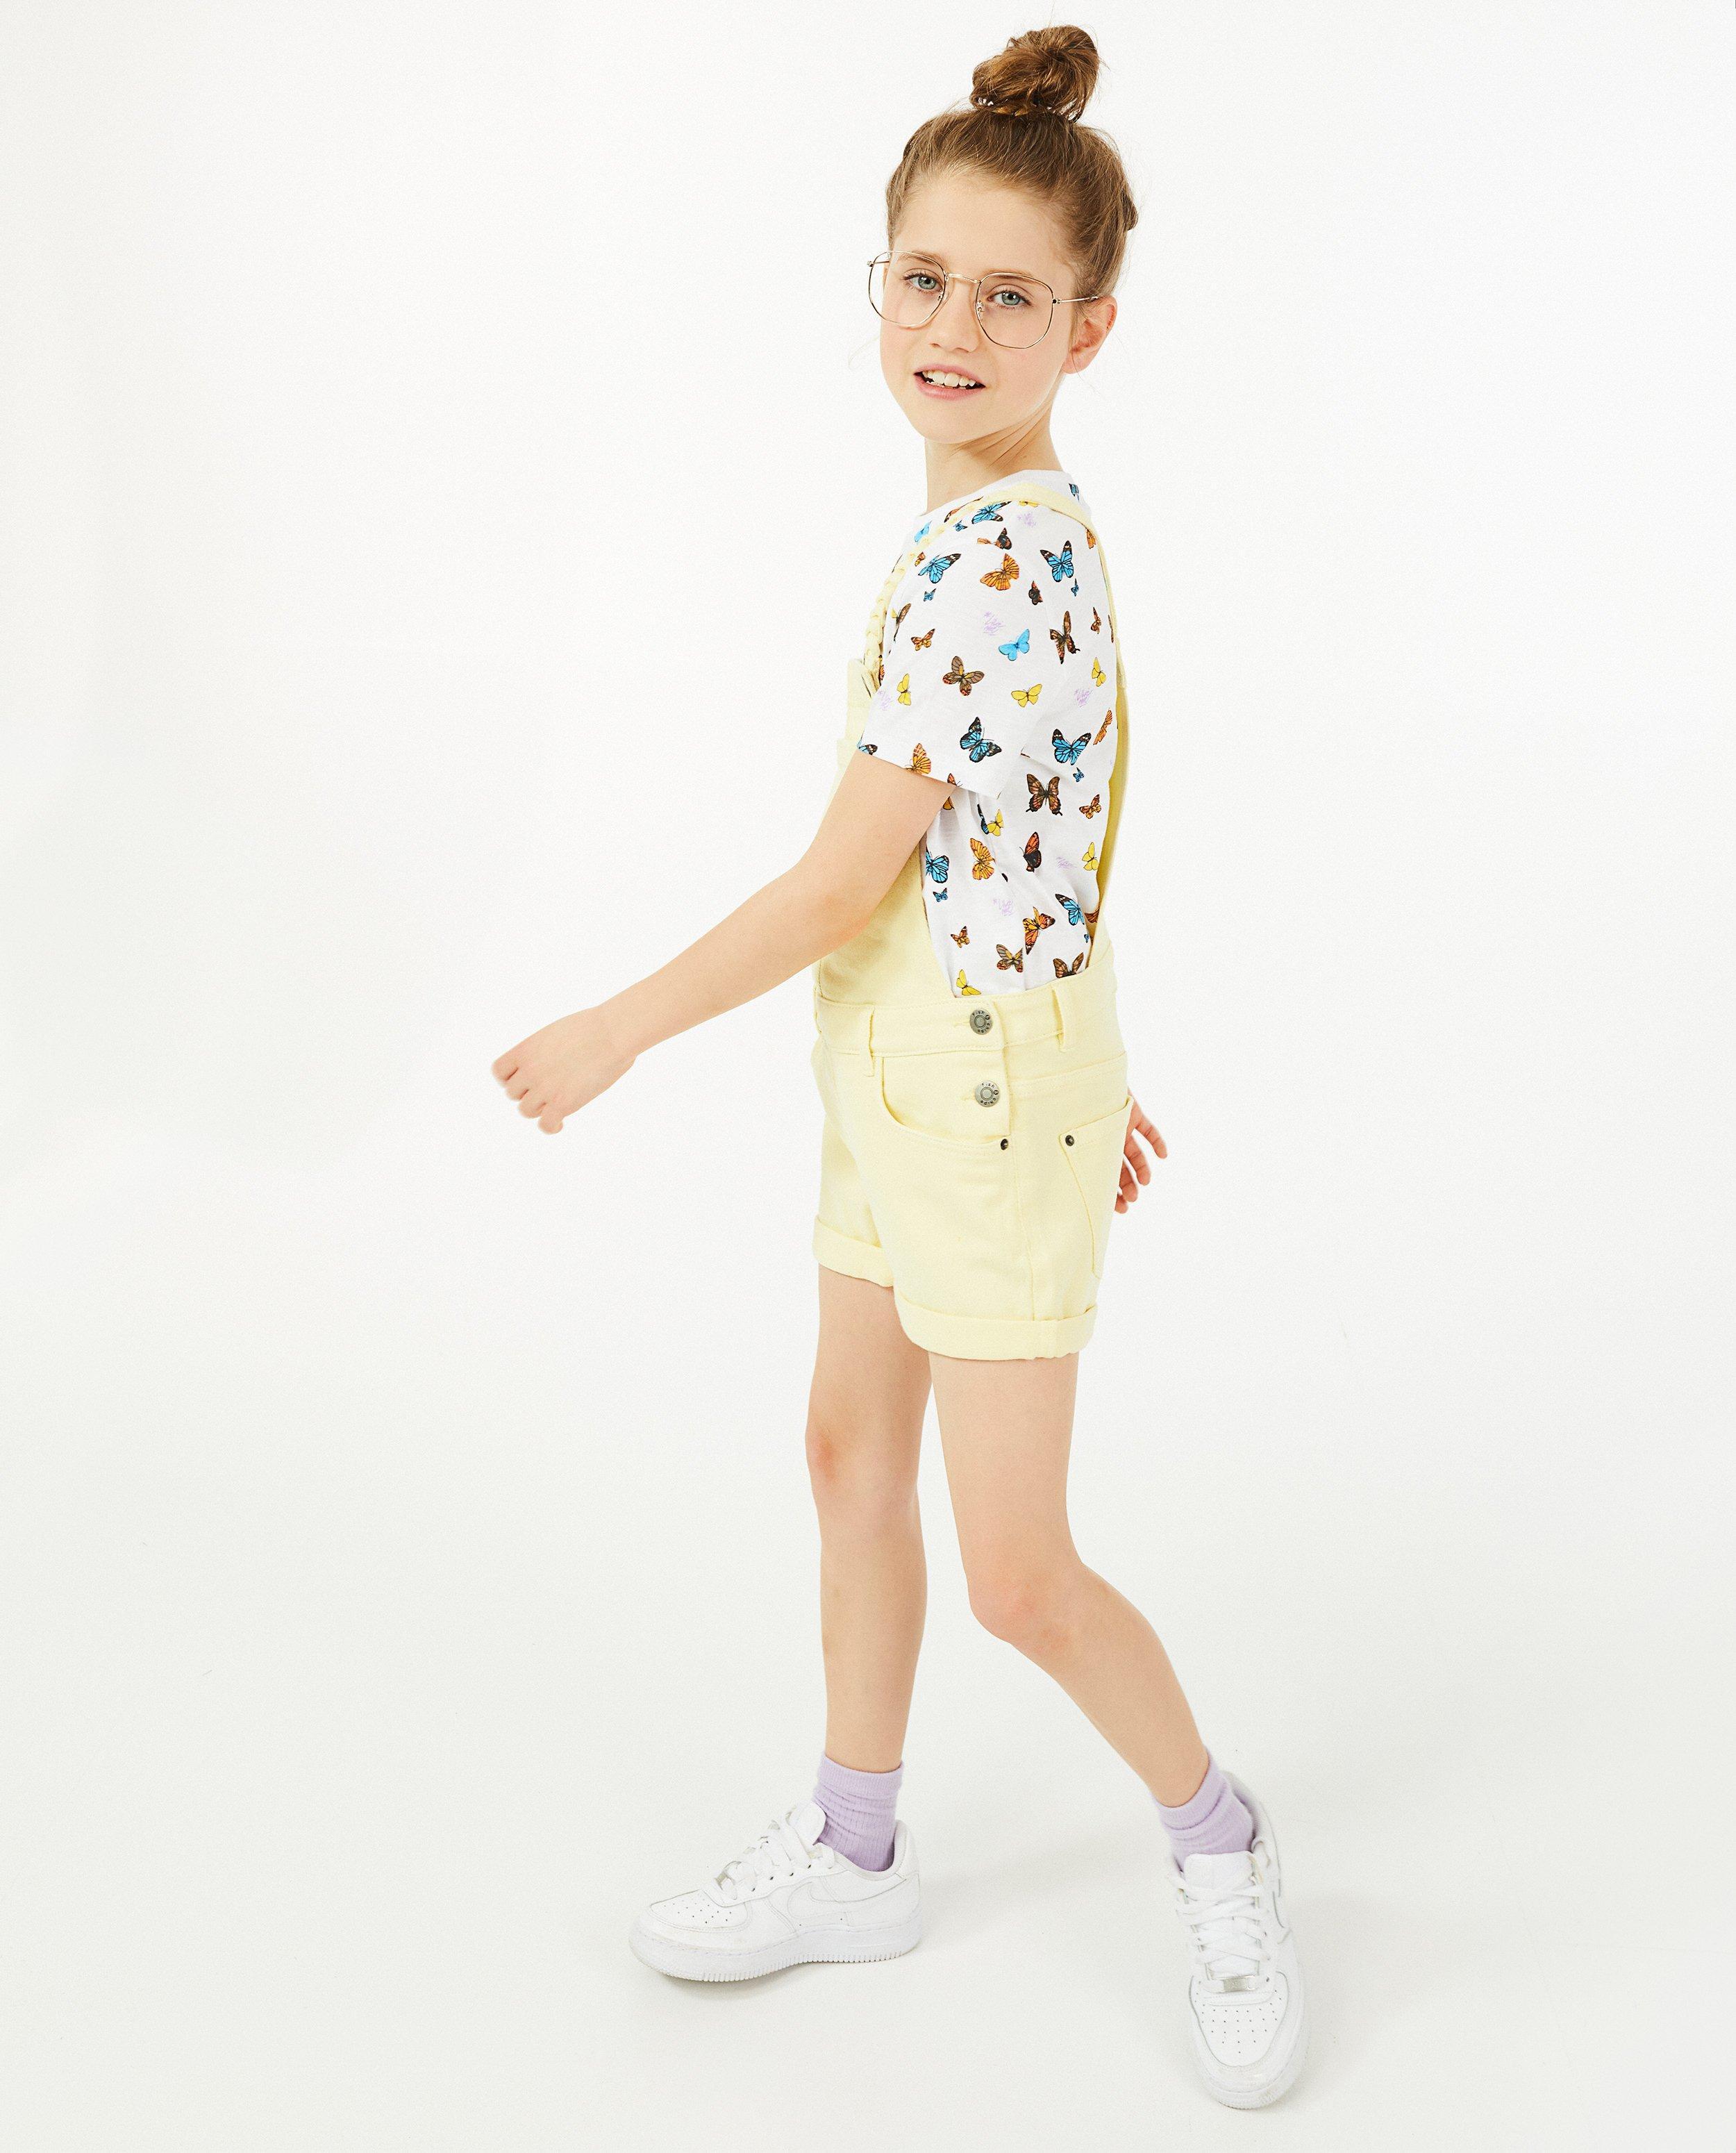 T-shirt à imprimé à papillons #LikeMe - blanc - Like Me